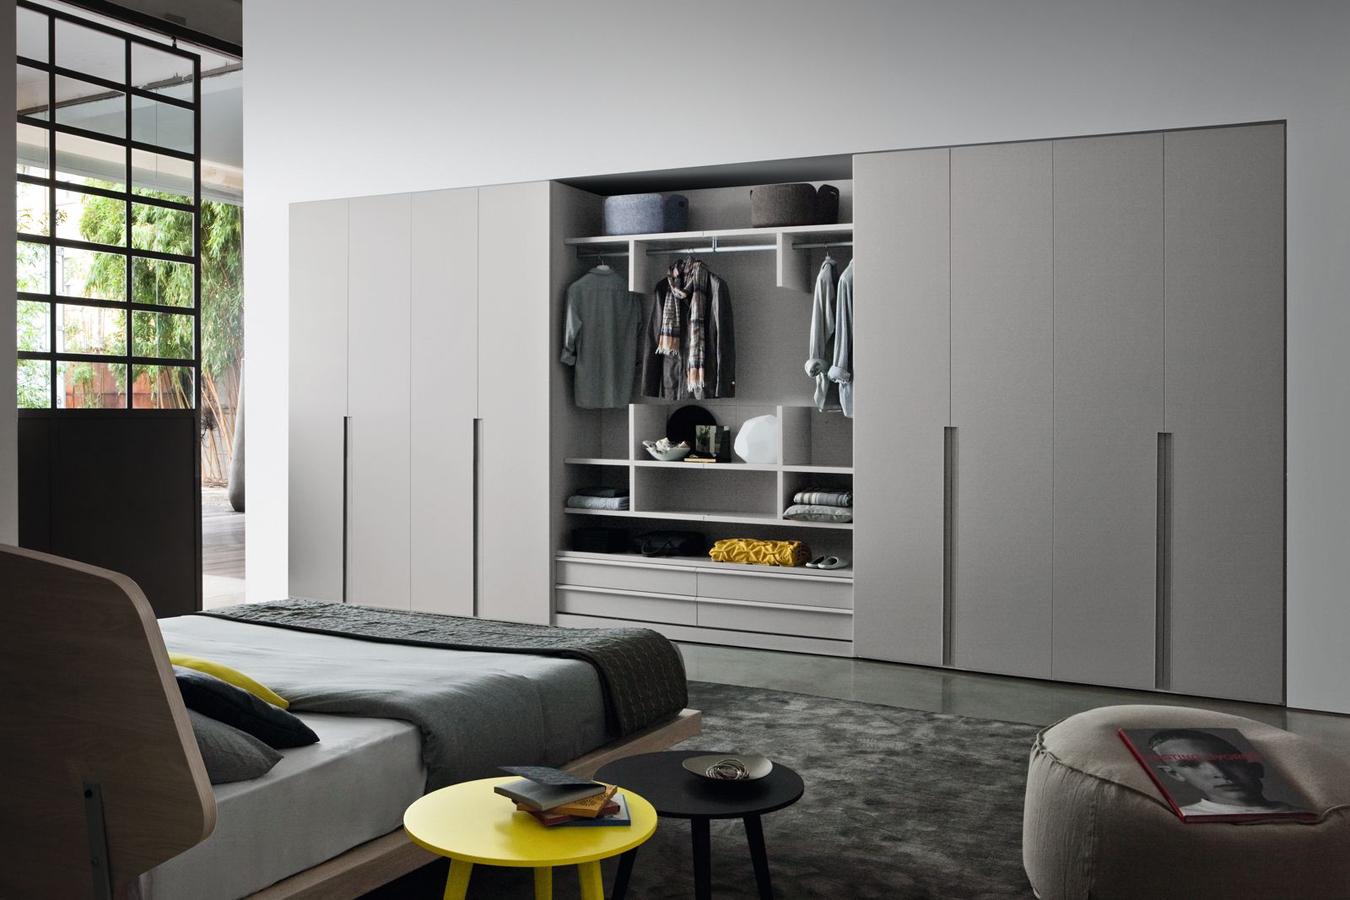 armadi e cabine armadio righetti mobili novara. Black Bedroom Furniture Sets. Home Design Ideas